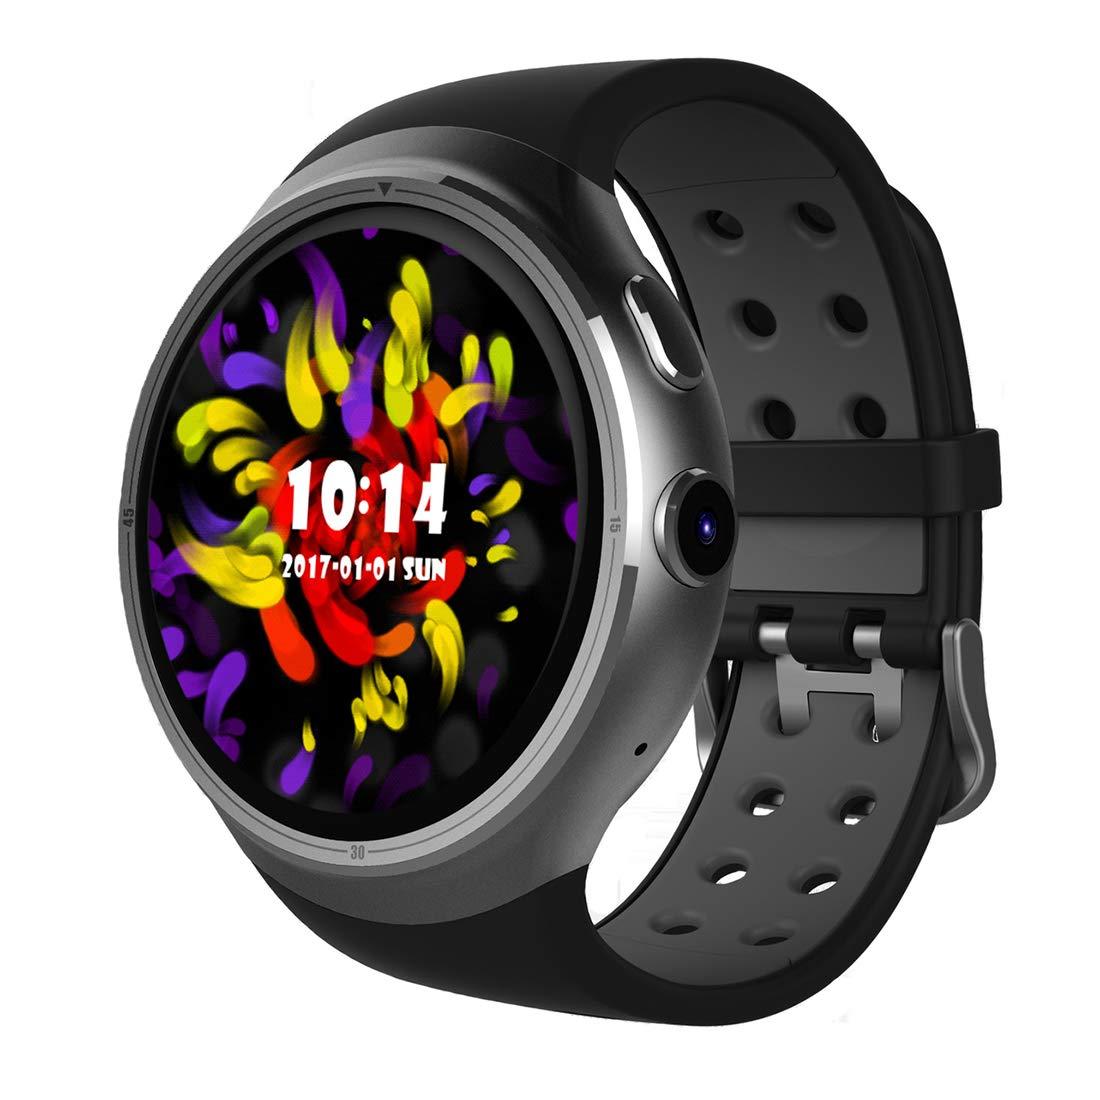 OOLIFENG Ritmo cardiaco Reloj Inteligente Teléfono Android 5.1 ...